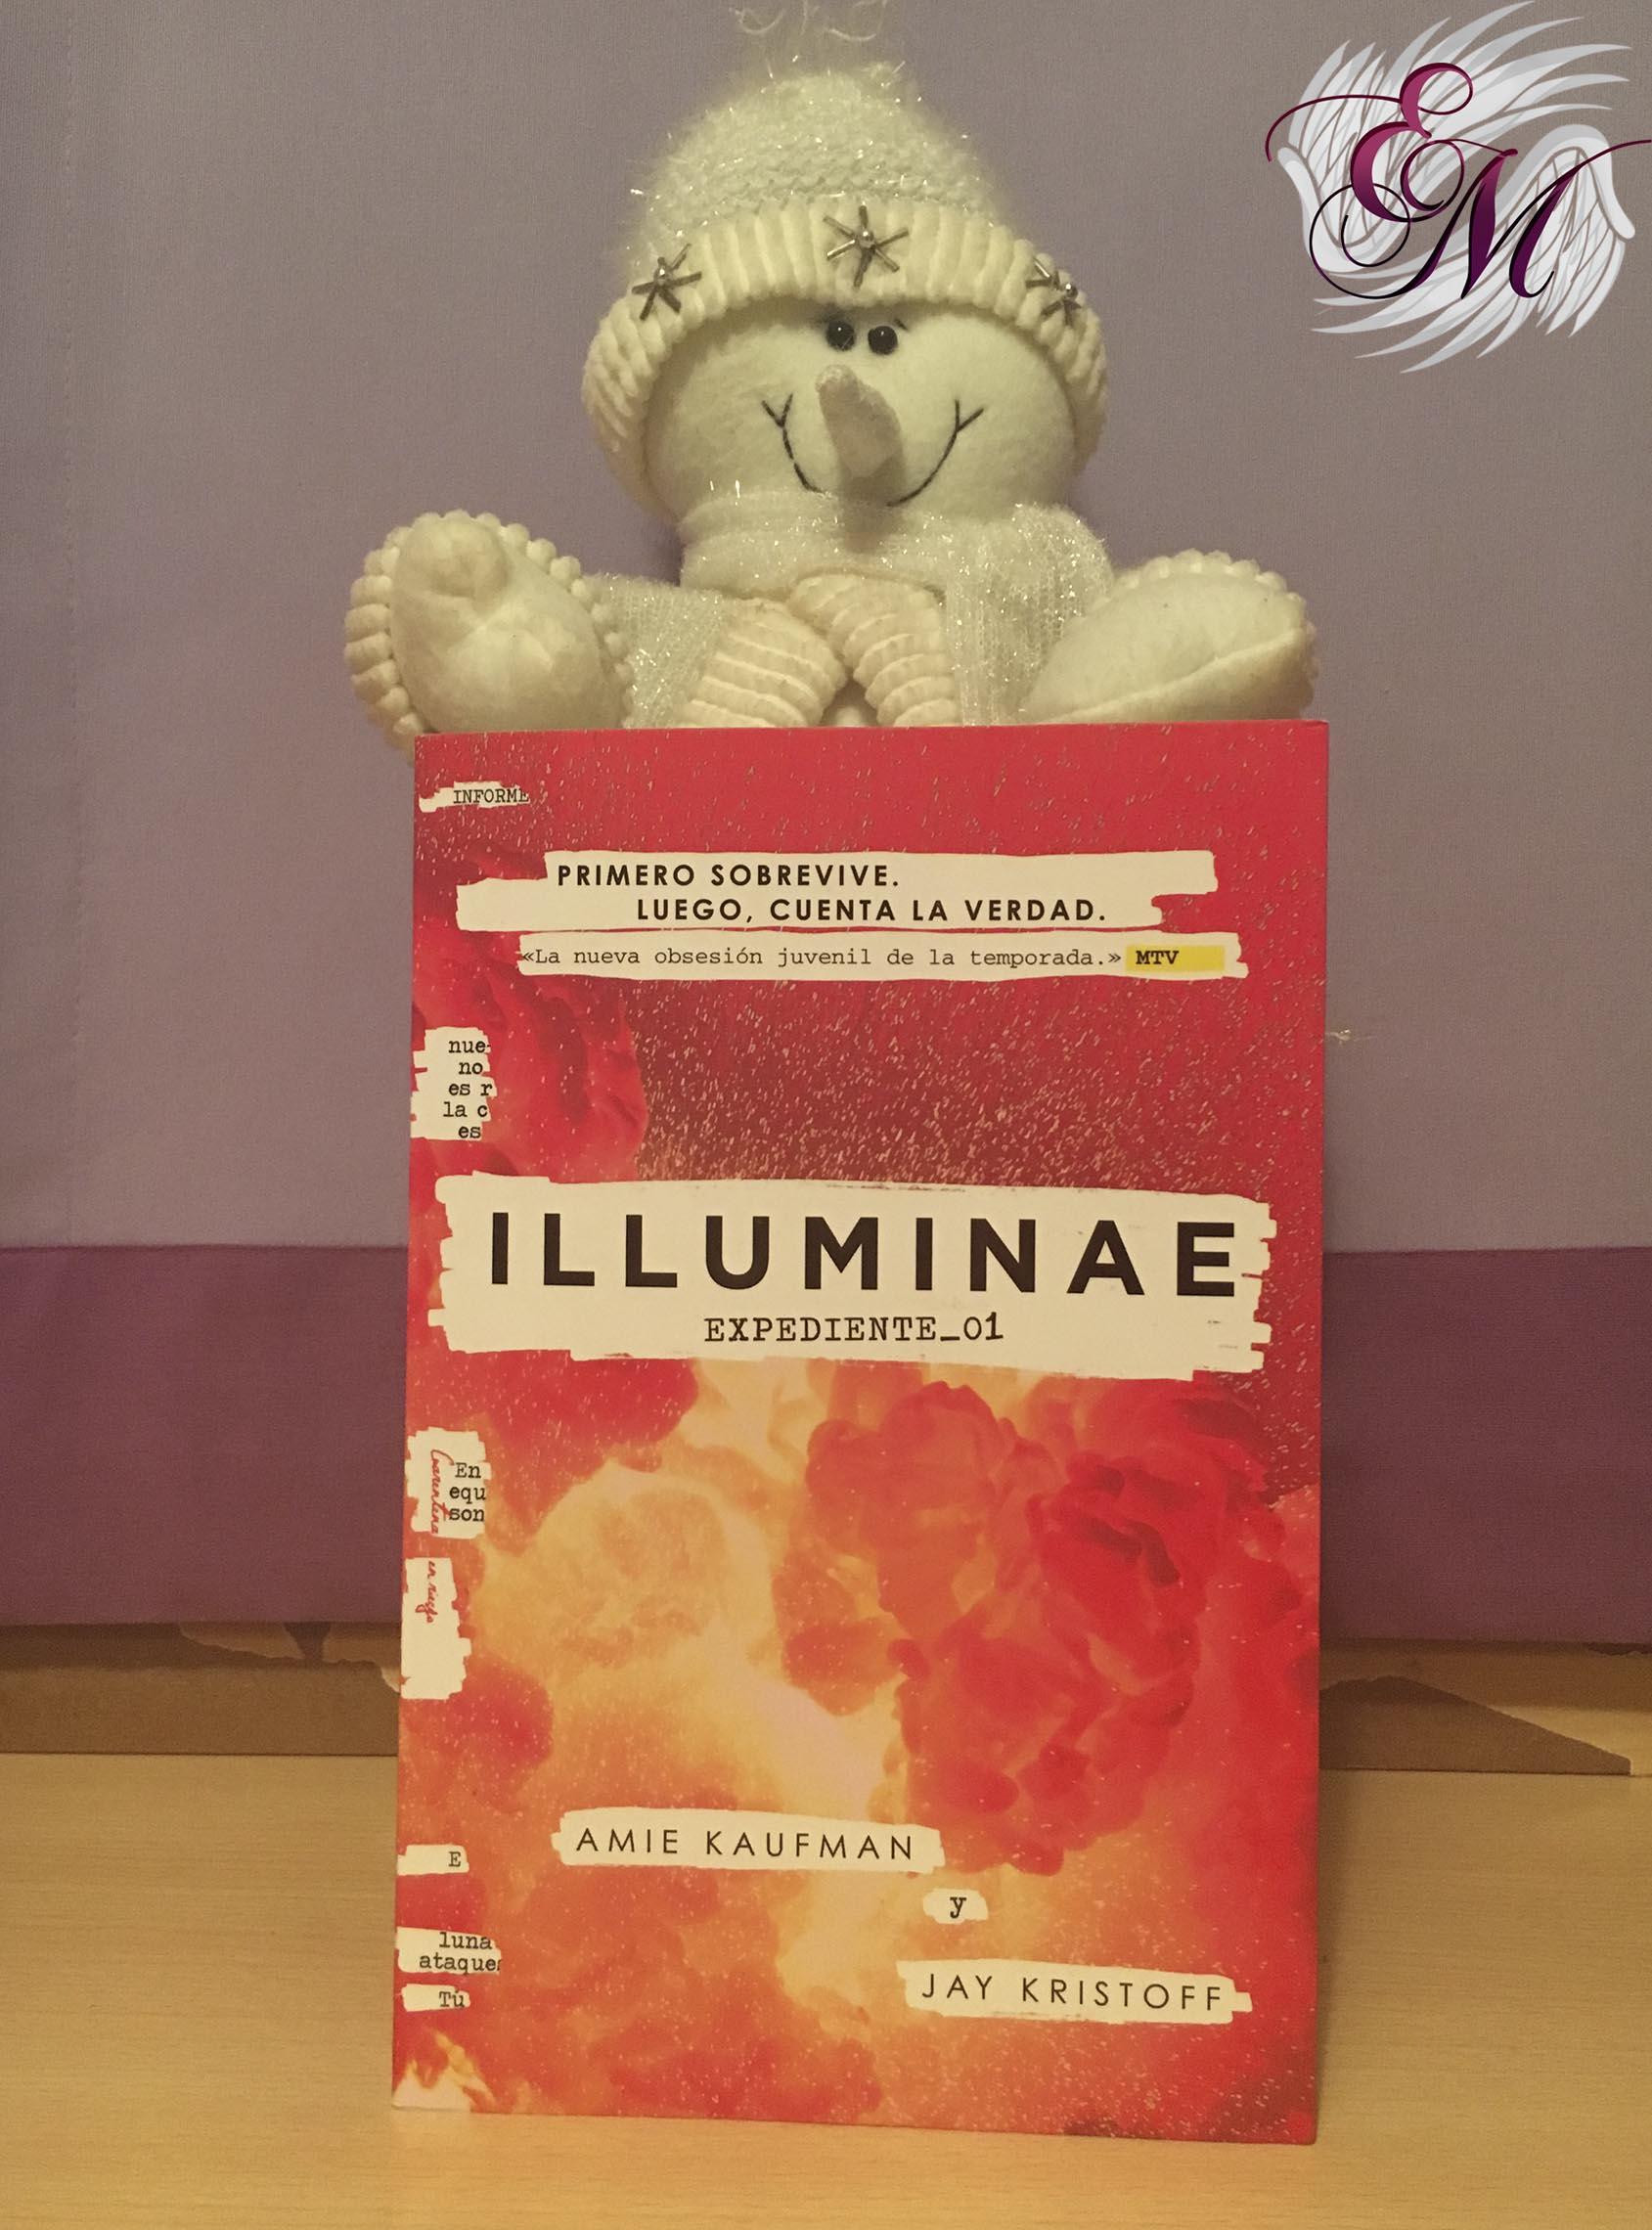 Illuminae Expediente 01, de Amie Kaufman & Jay Kristoff - Reseña